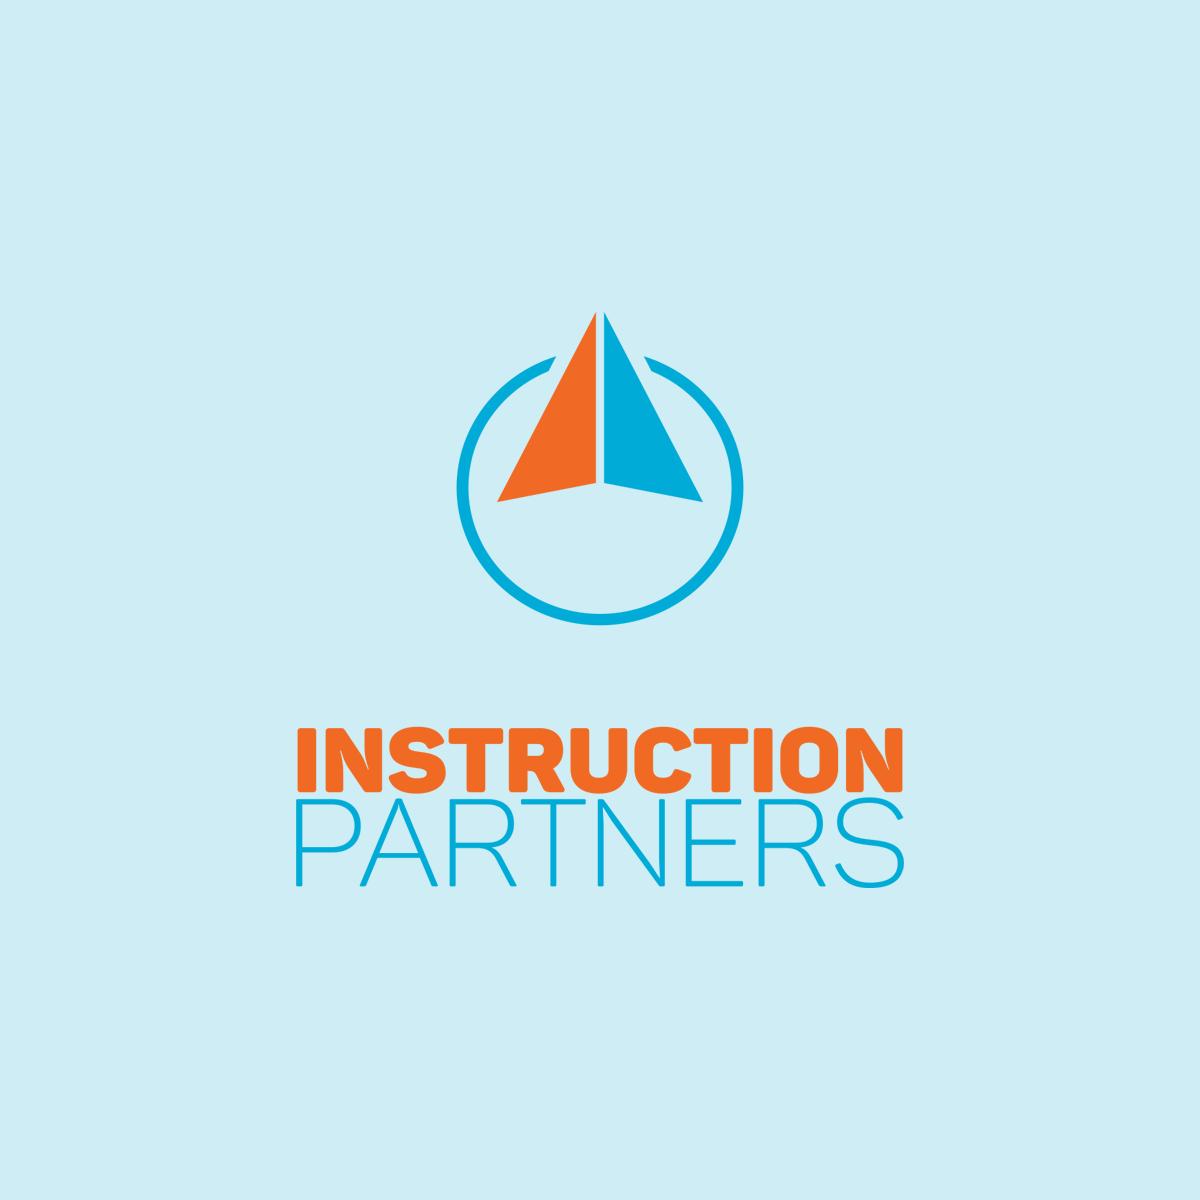 instruction-Partners-logo.png